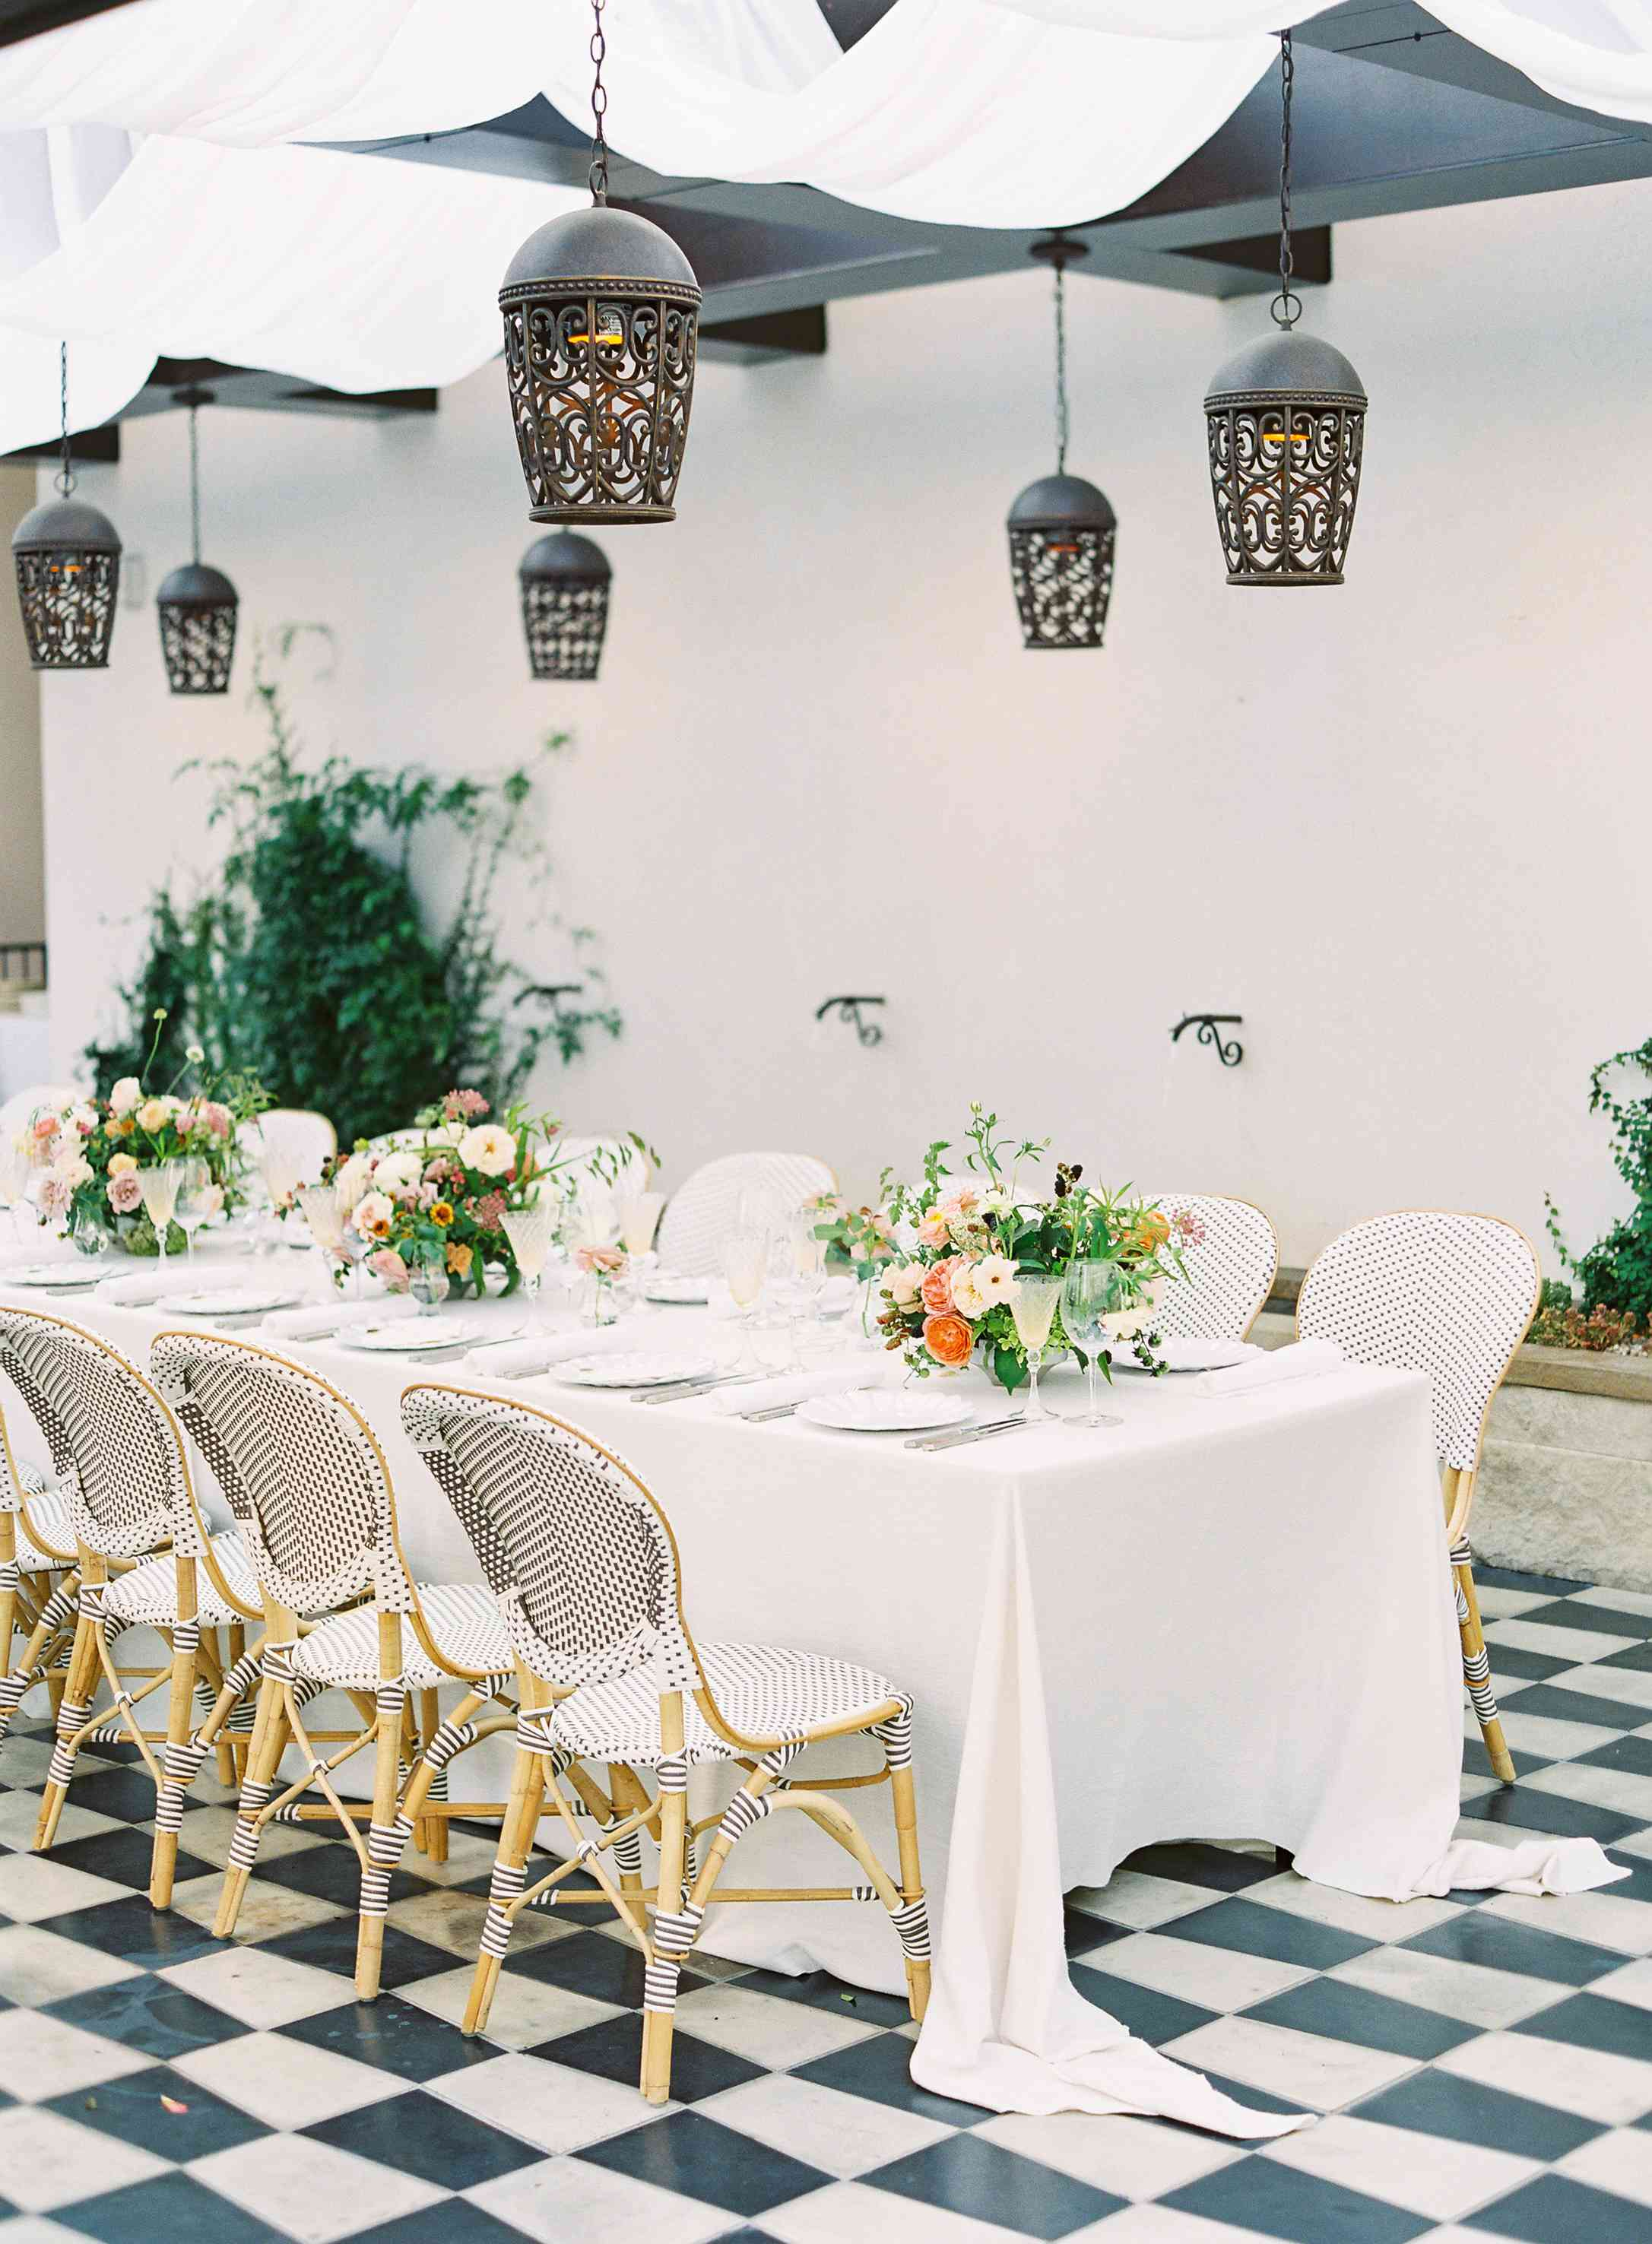 Dinner table at wedding reception